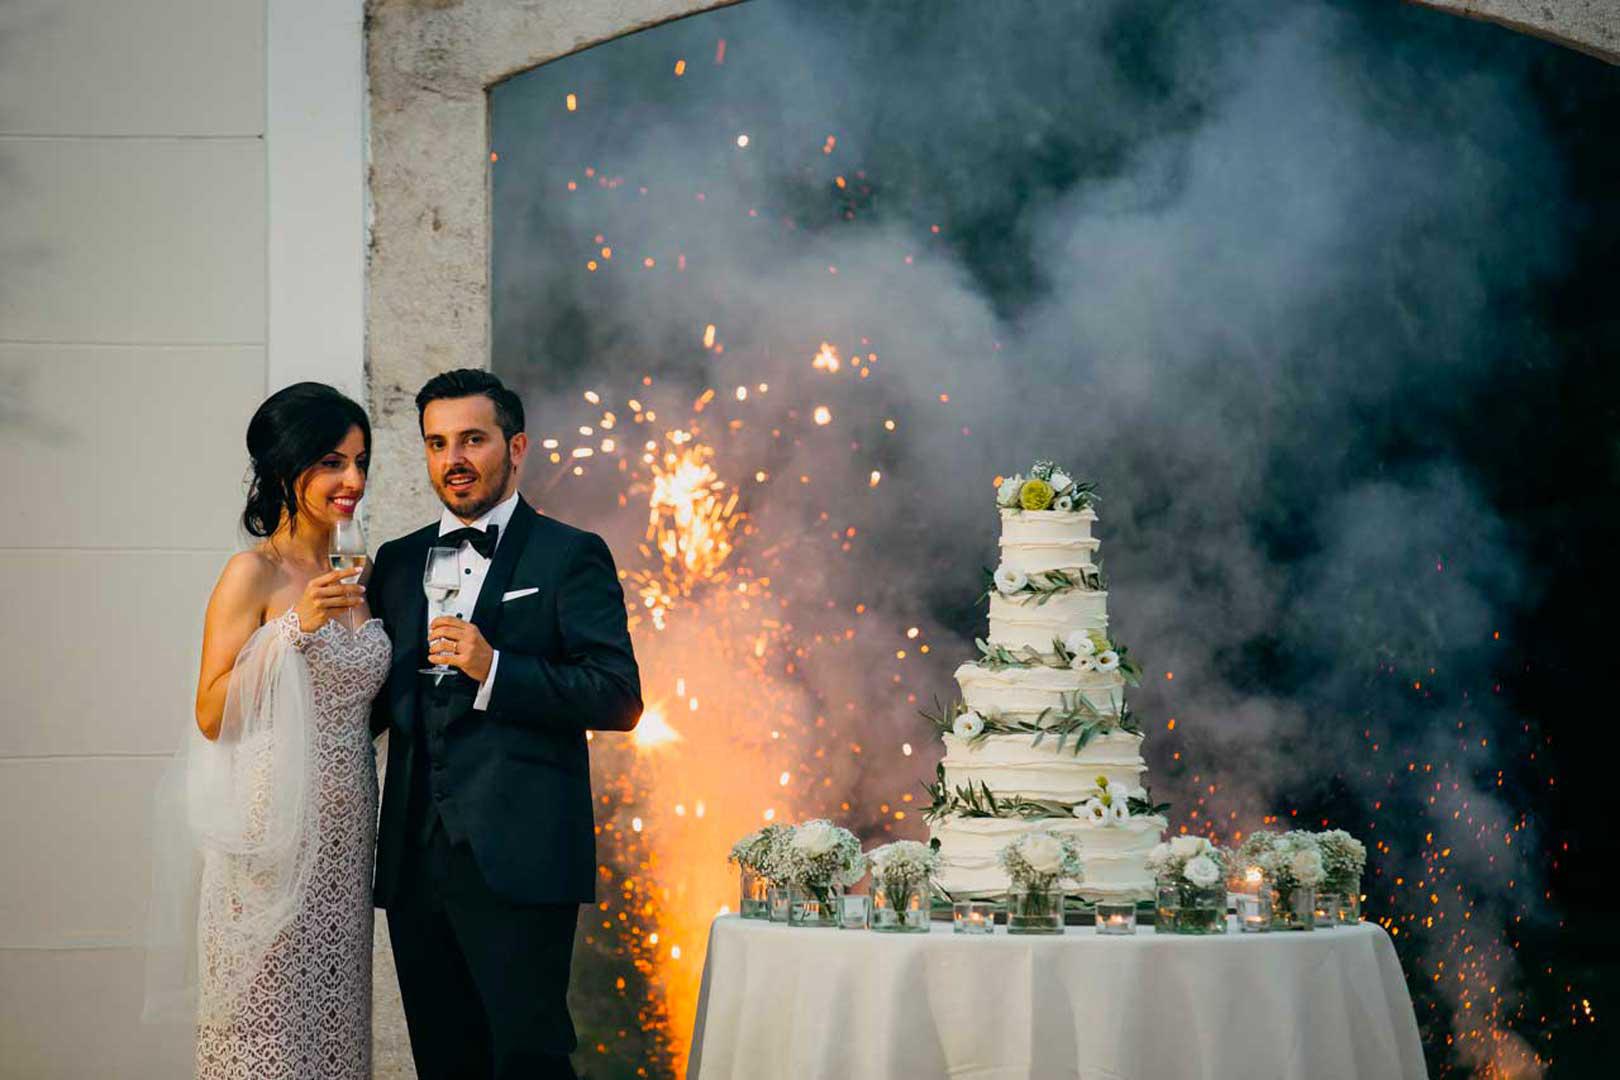 033-torta-sposi-gianni-lepore-fotografo-foggia